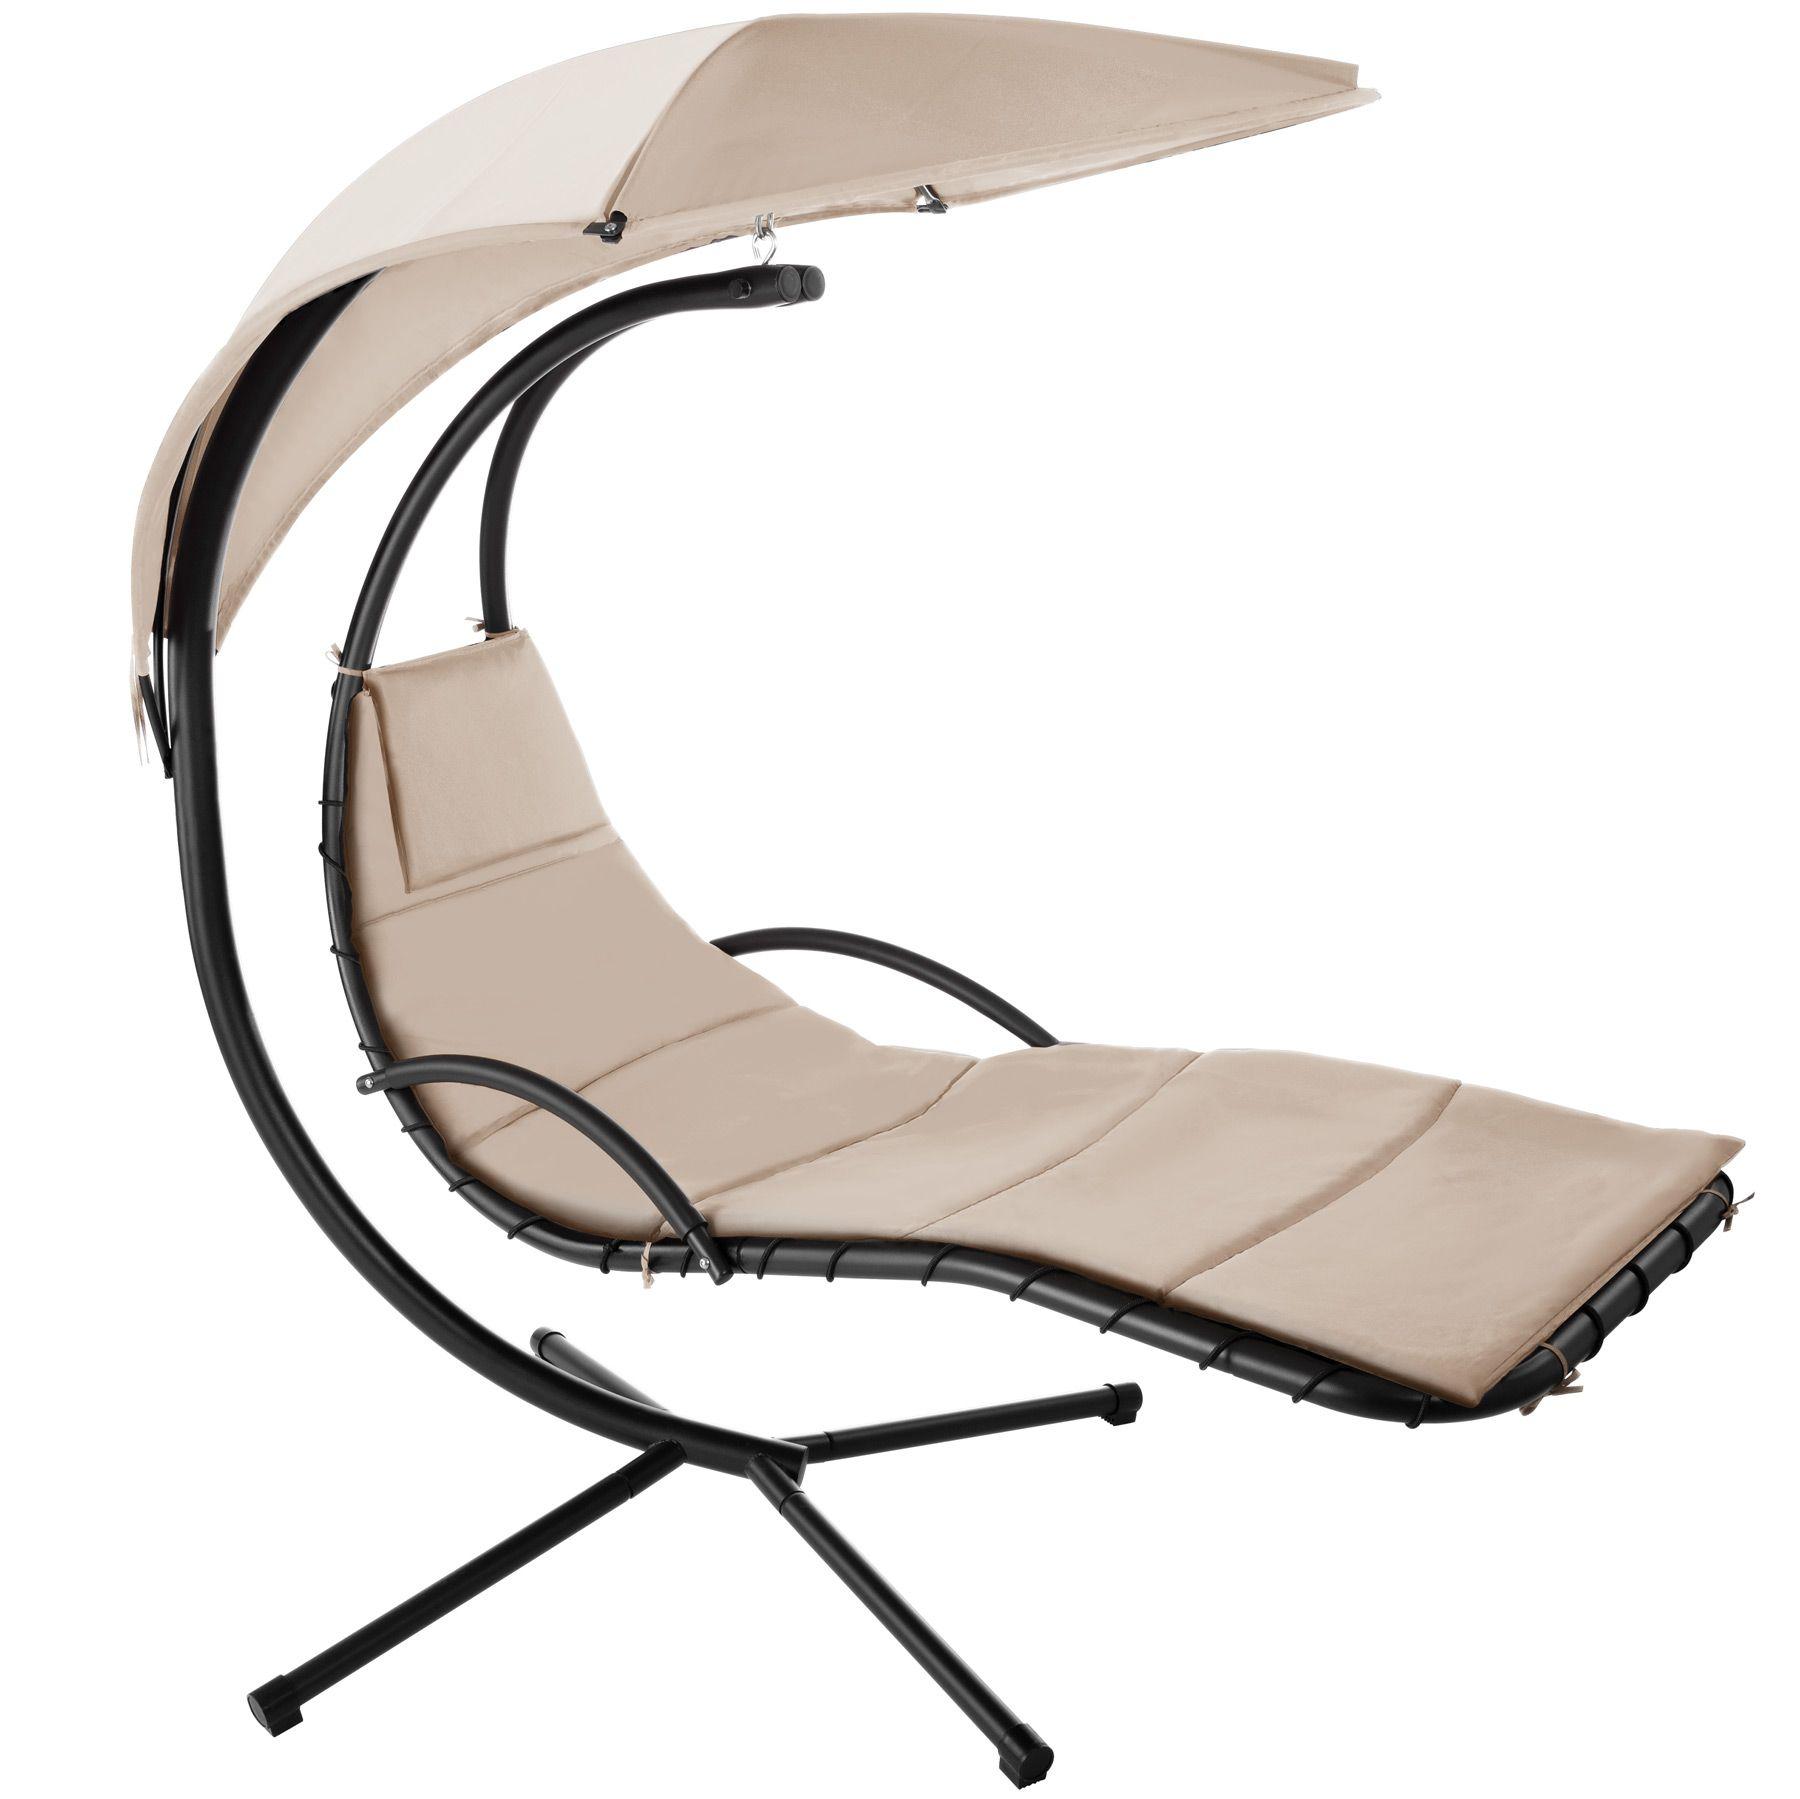 bain de soleil transat suspendu avec paresoleil fauteuil